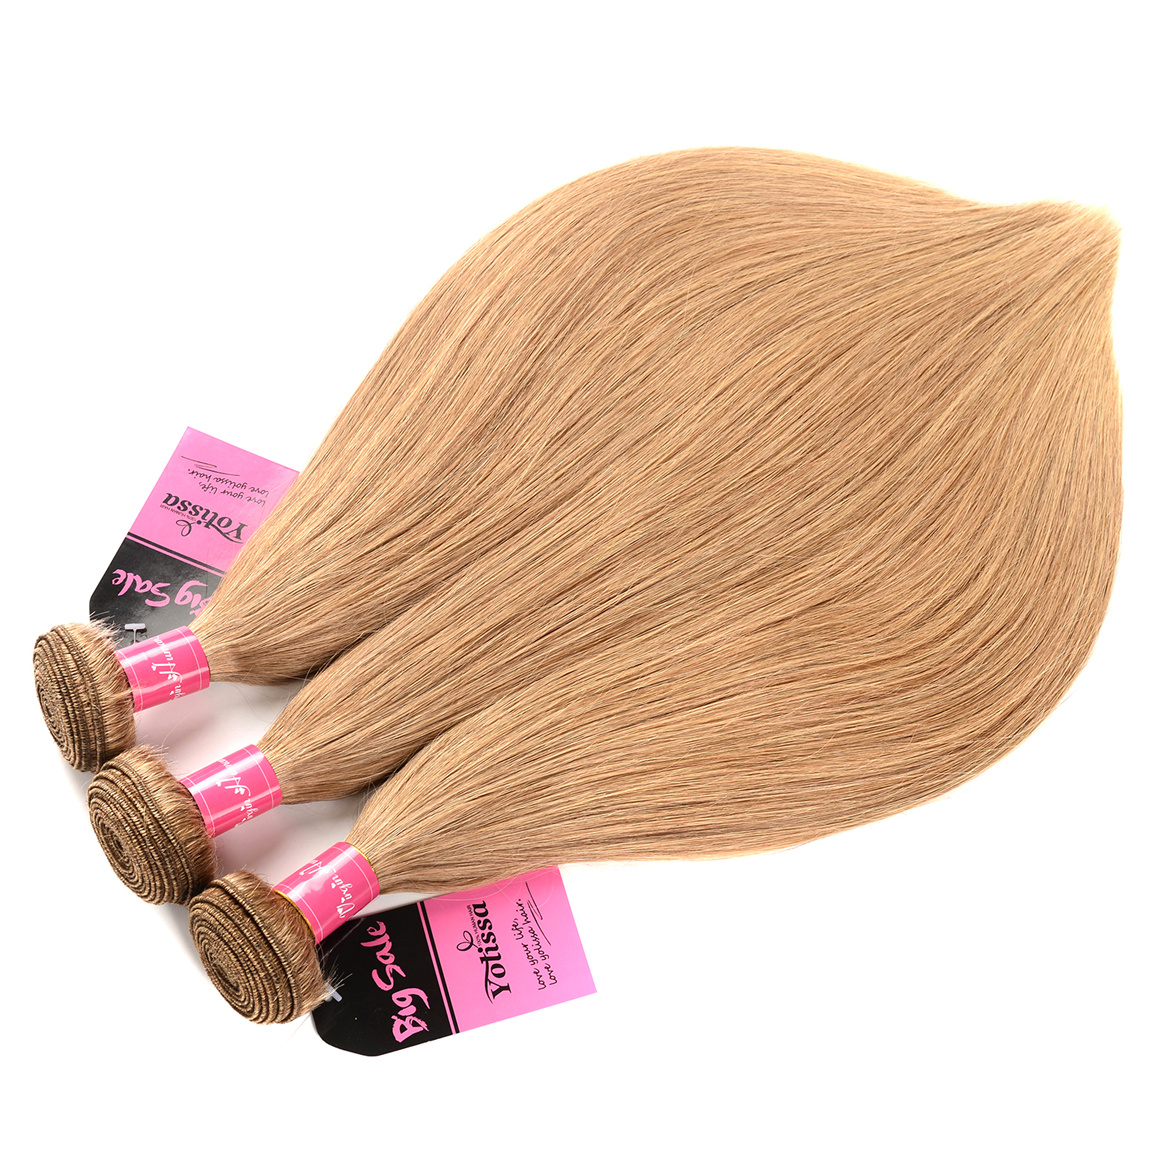 3 Bundles Straight Hair Bunldes